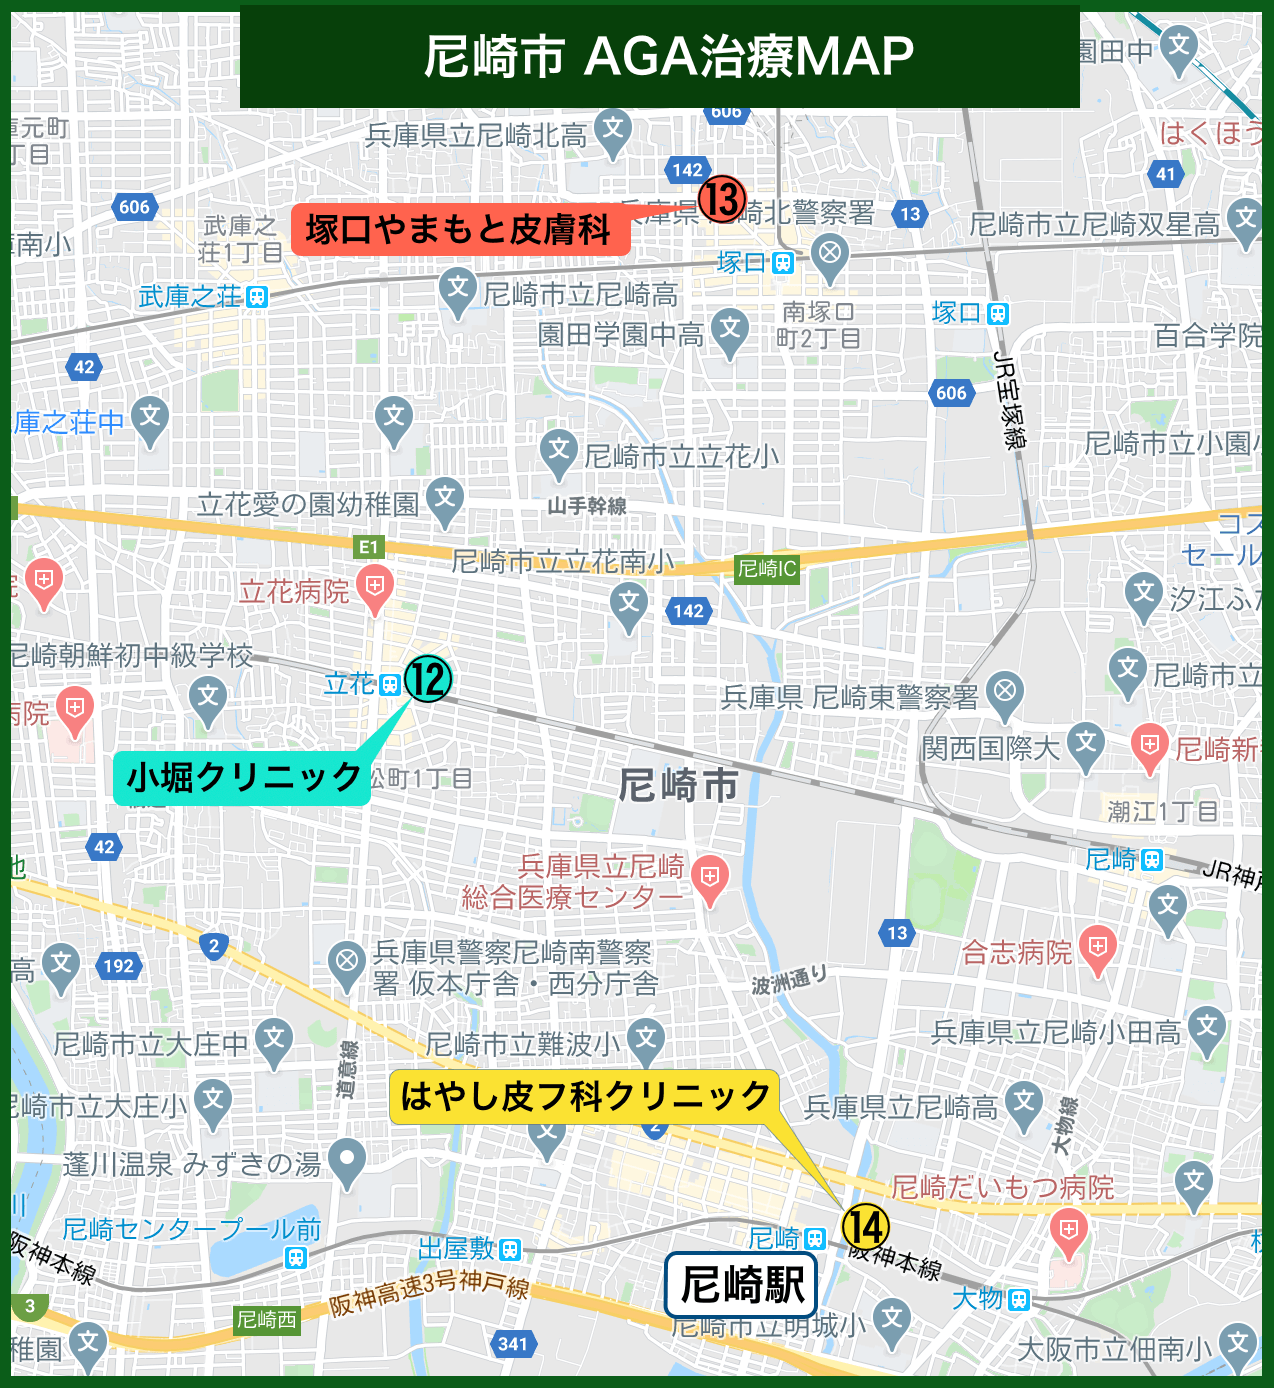 尼崎市 AGA治療MAP